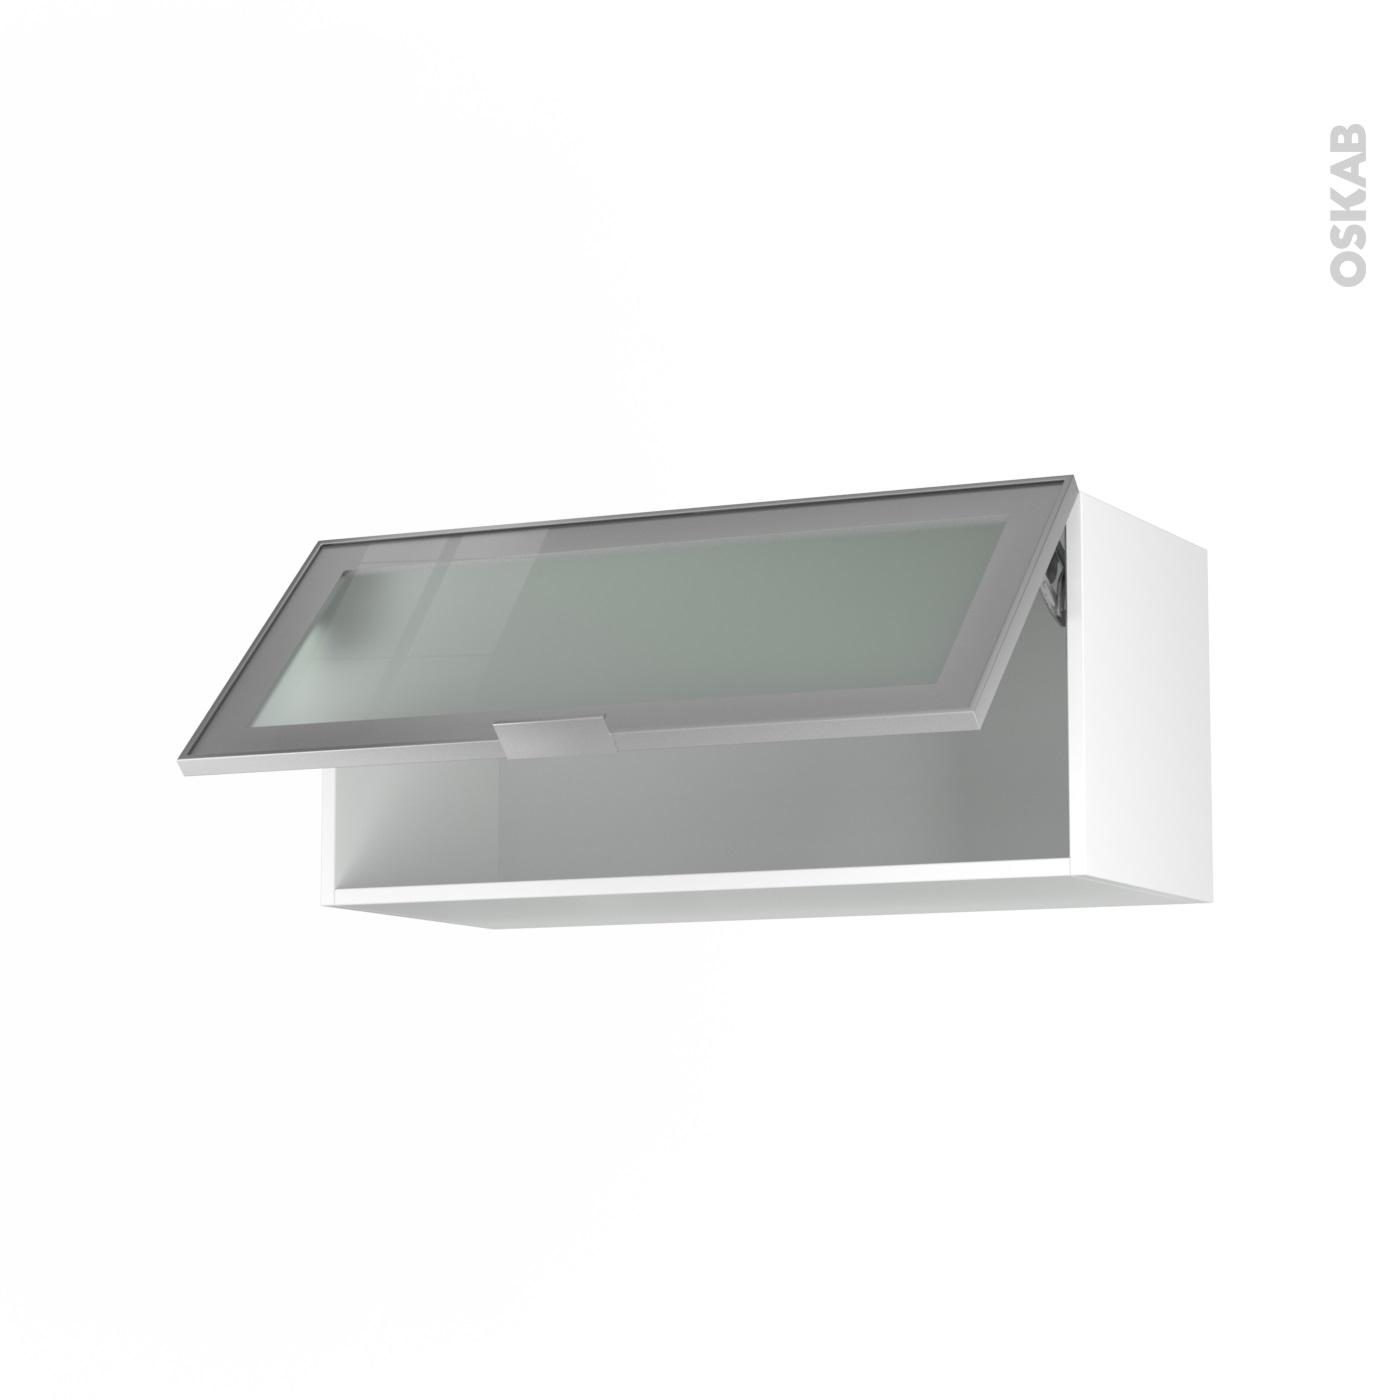 Meuble de cuisine Haut abattant vitré Façade alu 1 porte L80 x H35 x P37 cm  SOKLEO - Oskab